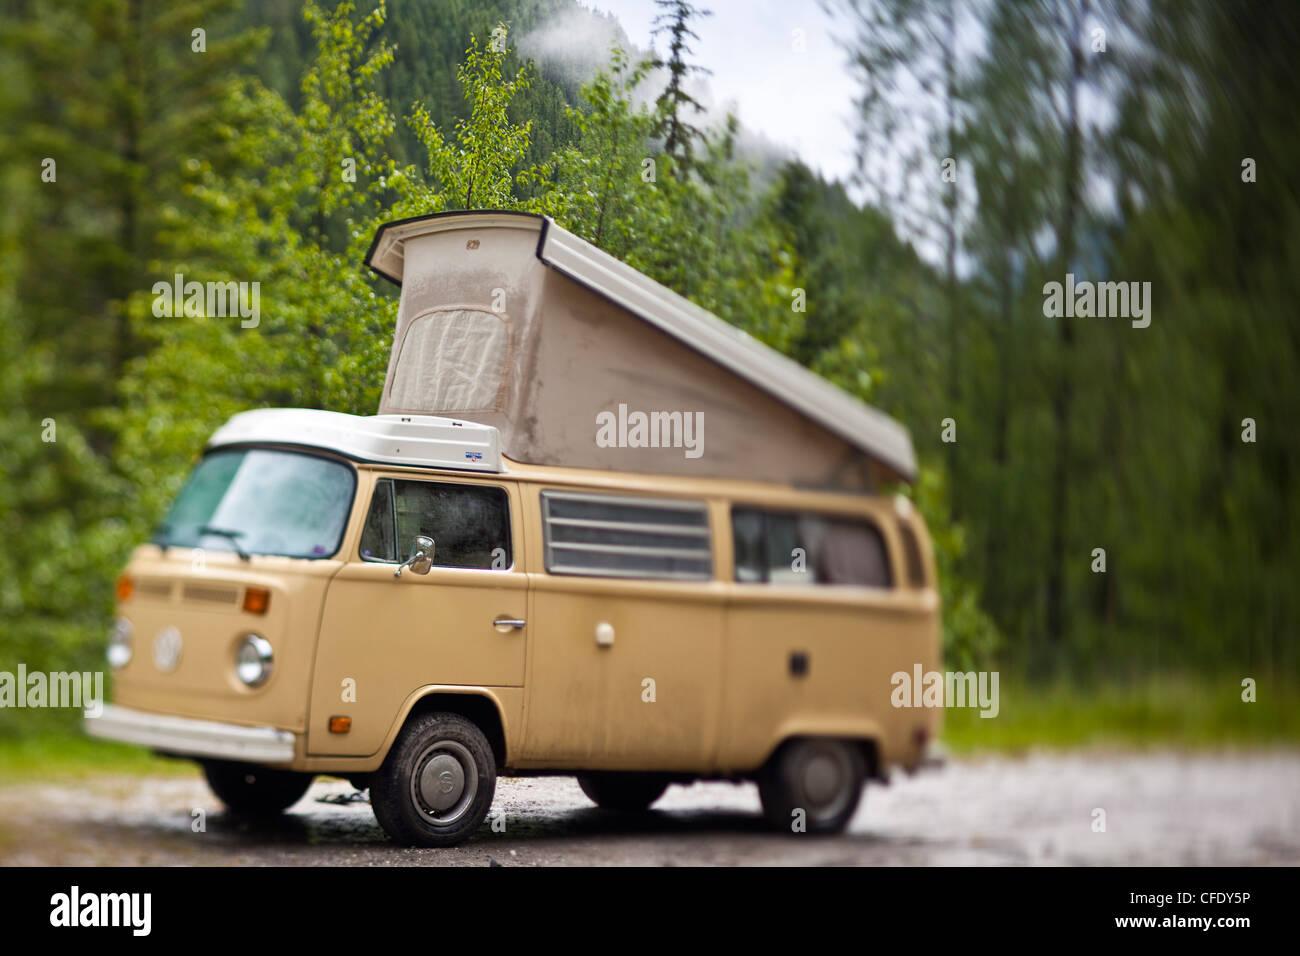 VW Camper Van, White River, British Columbia, Canada Stock